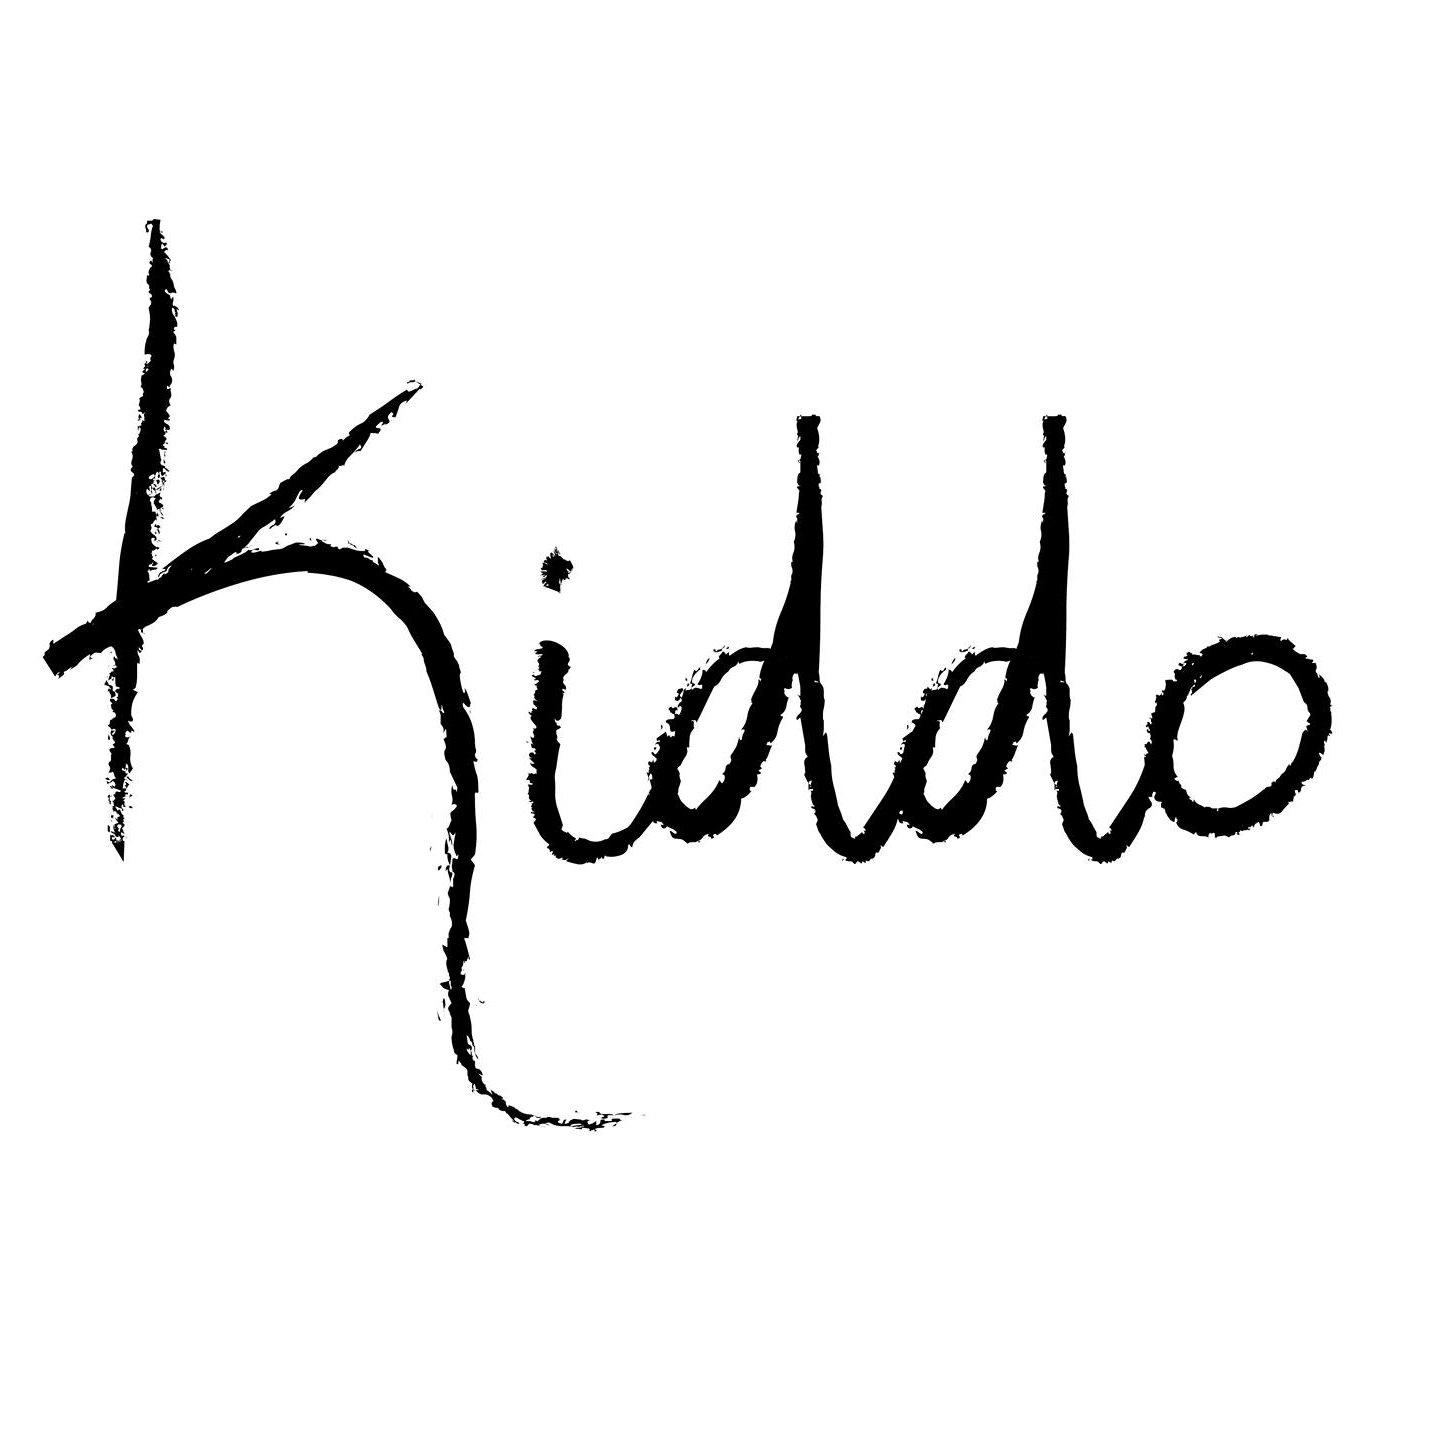 Kiddo Quotes Koikidd0 Twitter